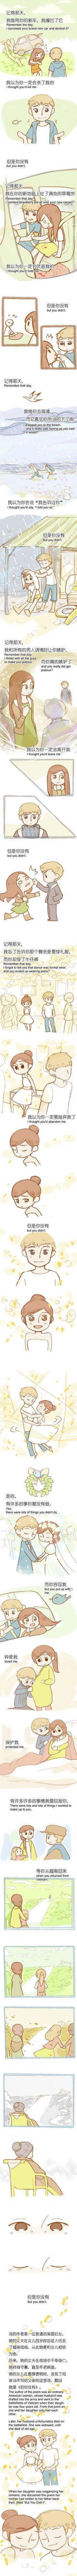 but-you-didnt-chinese-translation-comic-strip-english-subtitles. Oh my gosh I'm crying..